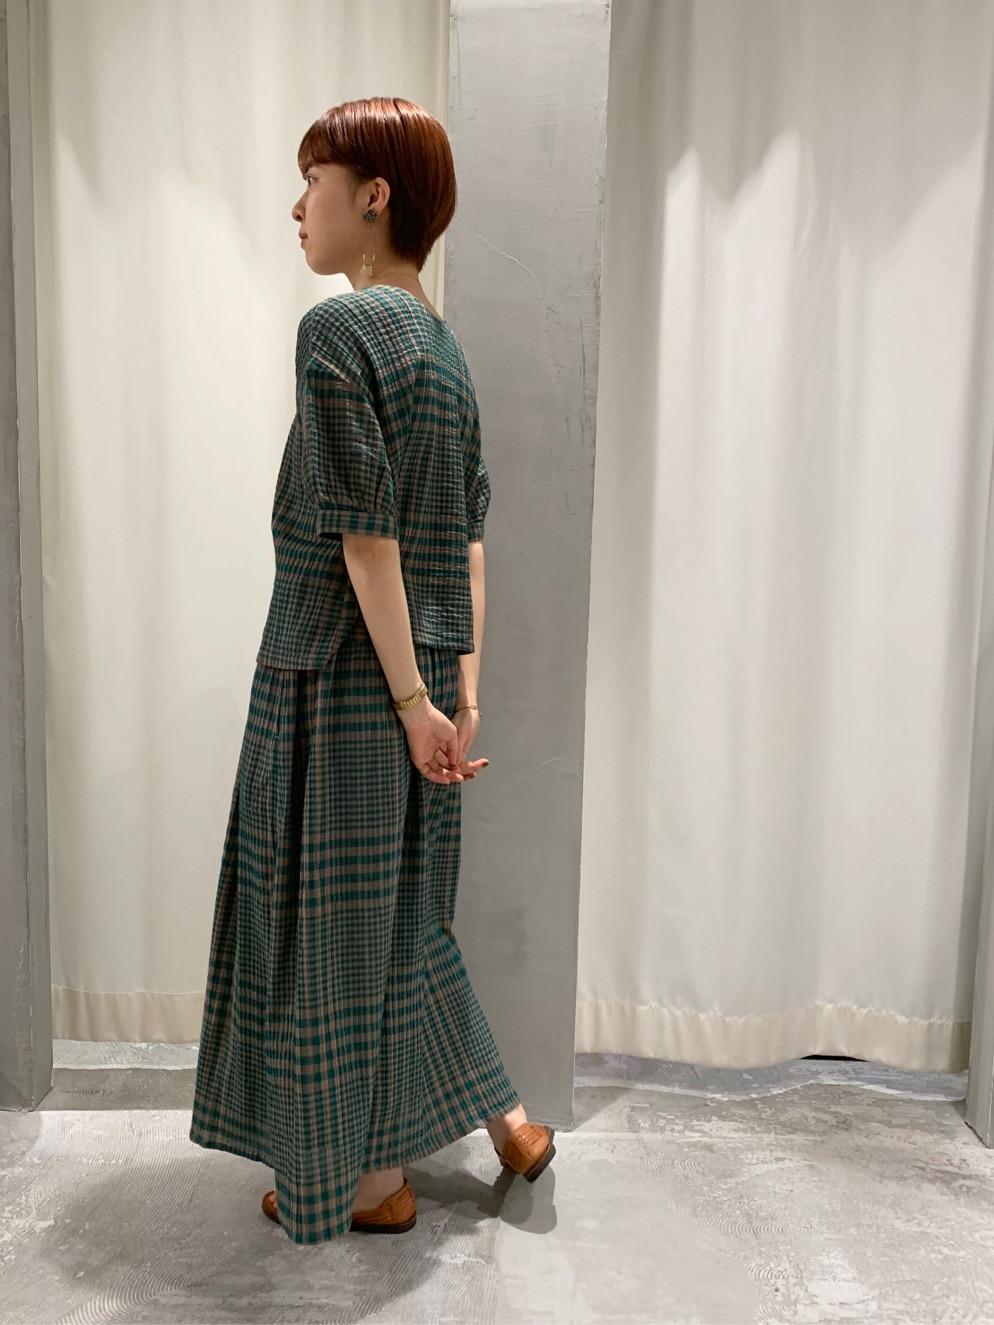 - CHILD WOMAN CHILD WOMAN , PAR ICI ルミネ横浜 身長:158cm 2020.09.01